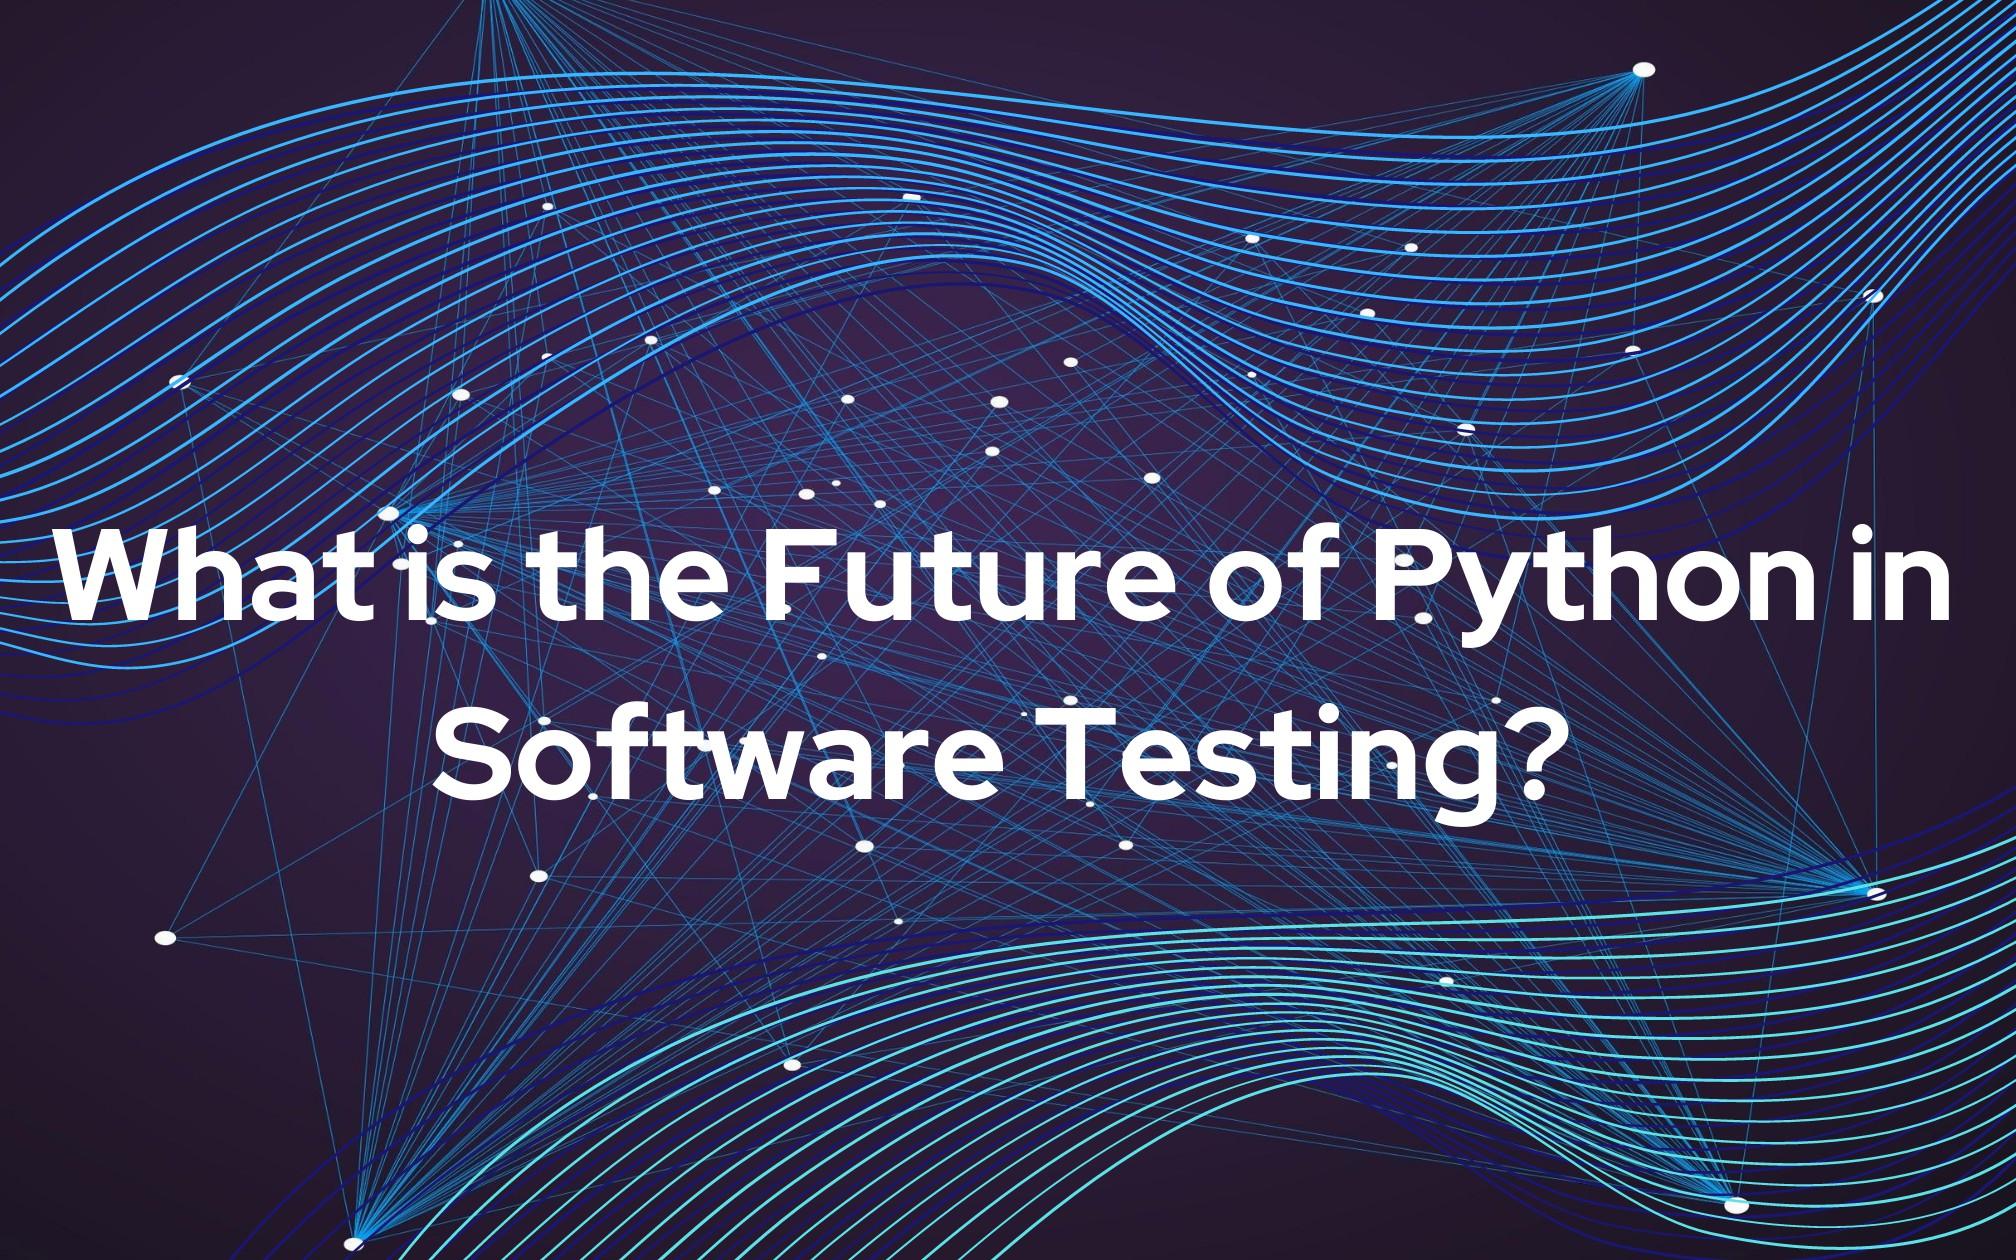 Is Python the Future of Programming? - DZone Performance